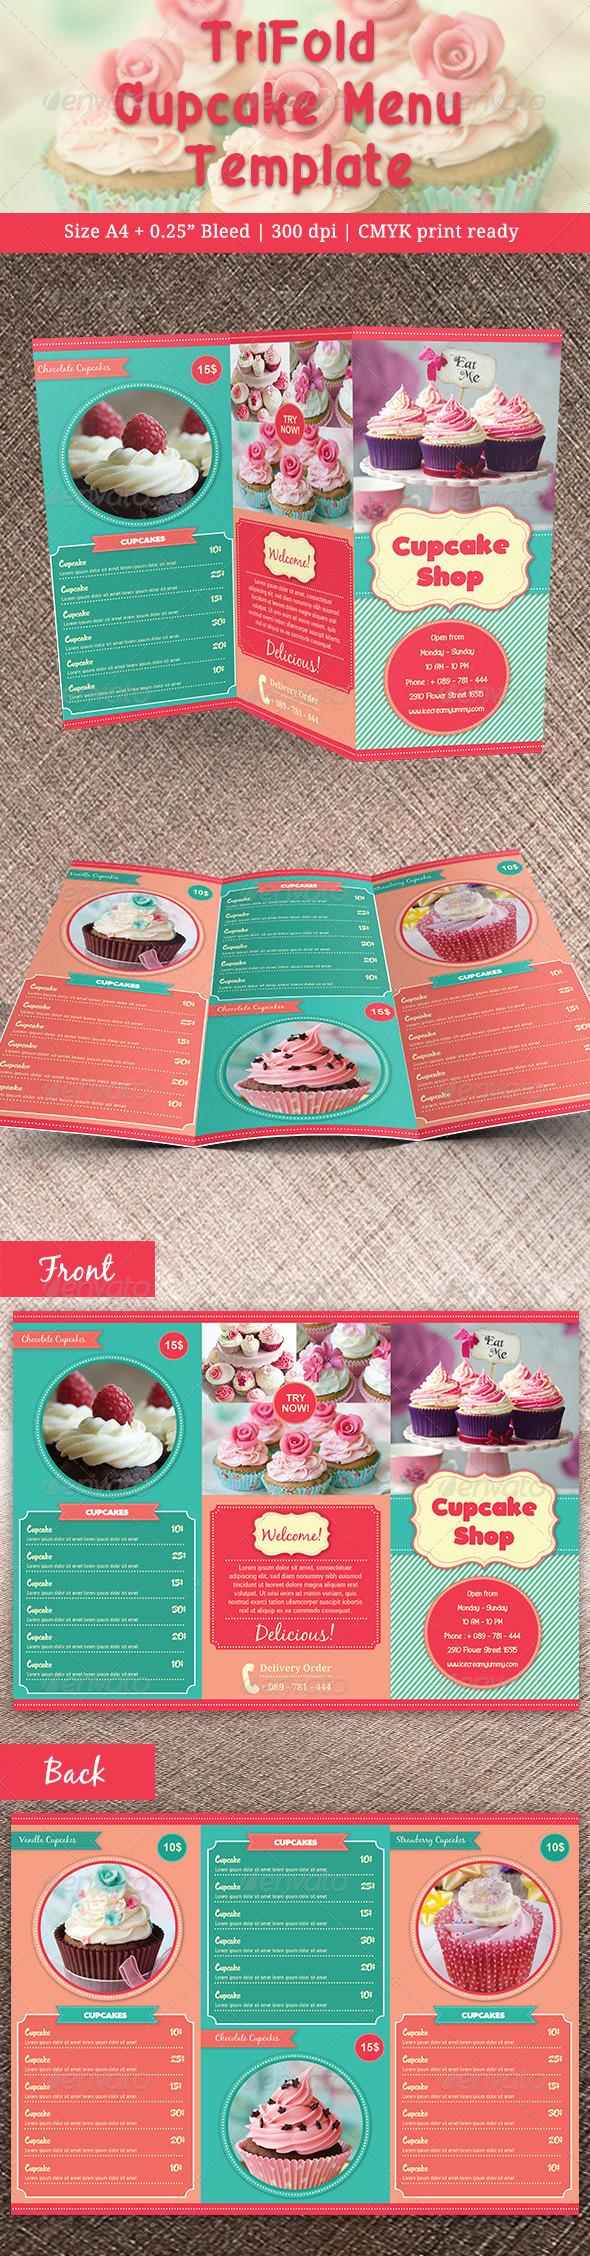 TriFold Cupcakes Menu